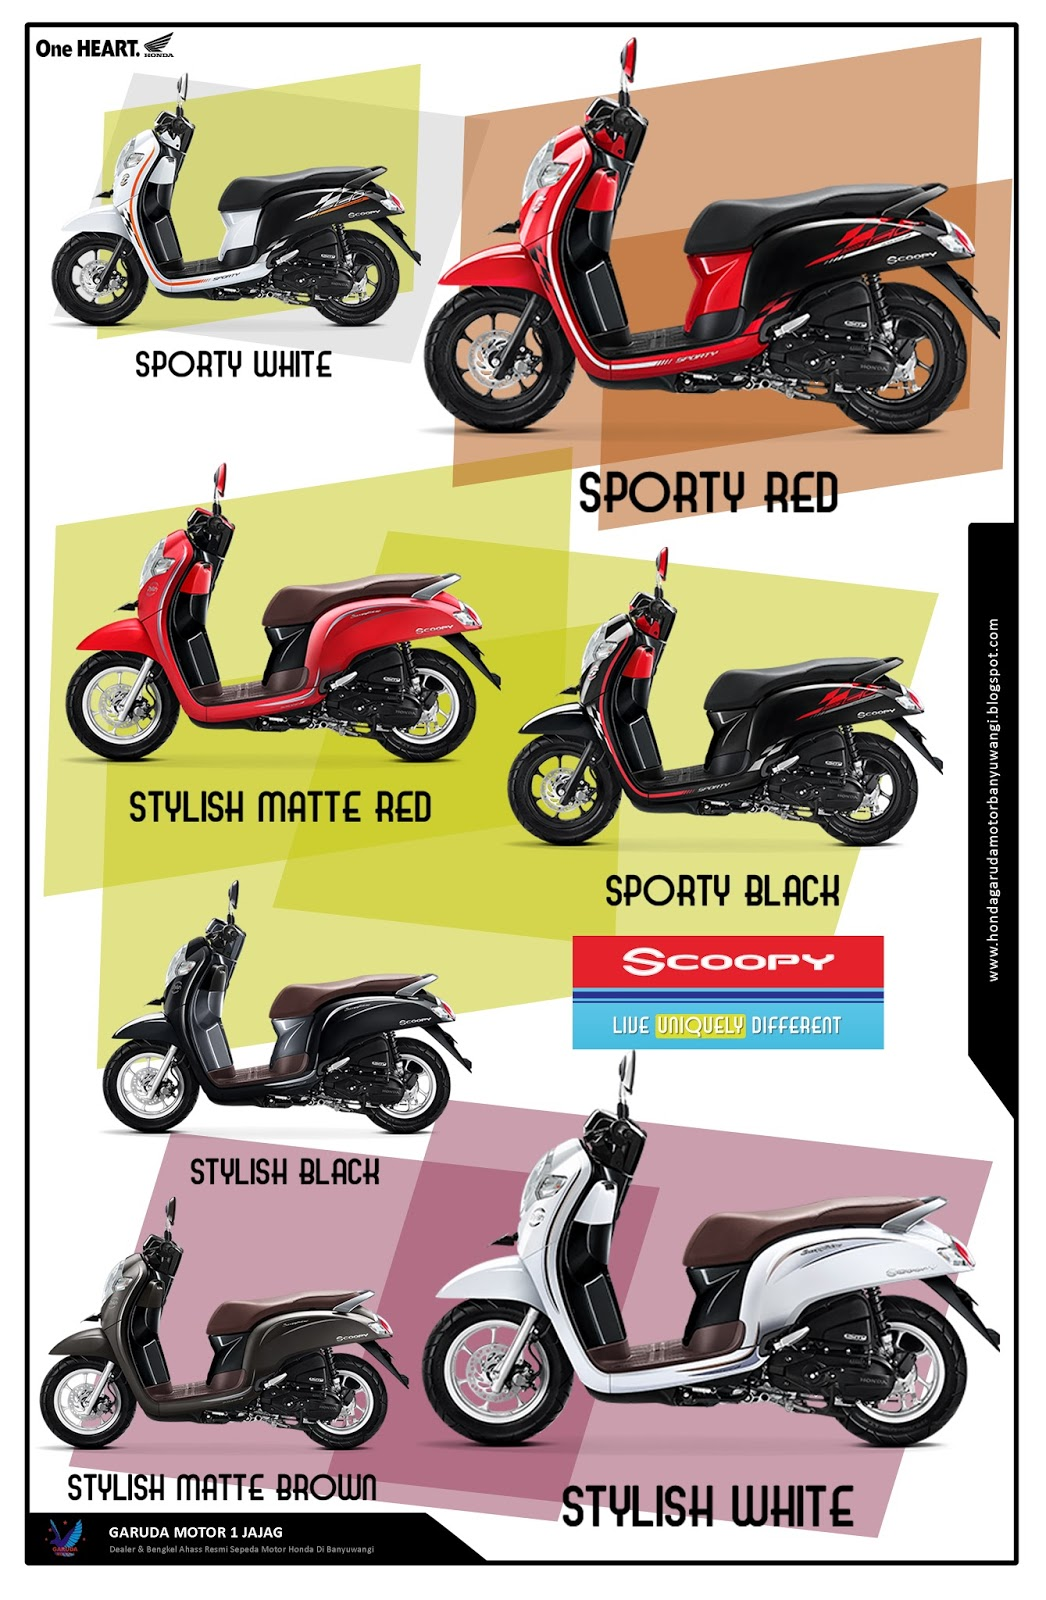 Honda Scoopy Warna Merah Tilan Honda Scoopy Warna Merah Terbaru